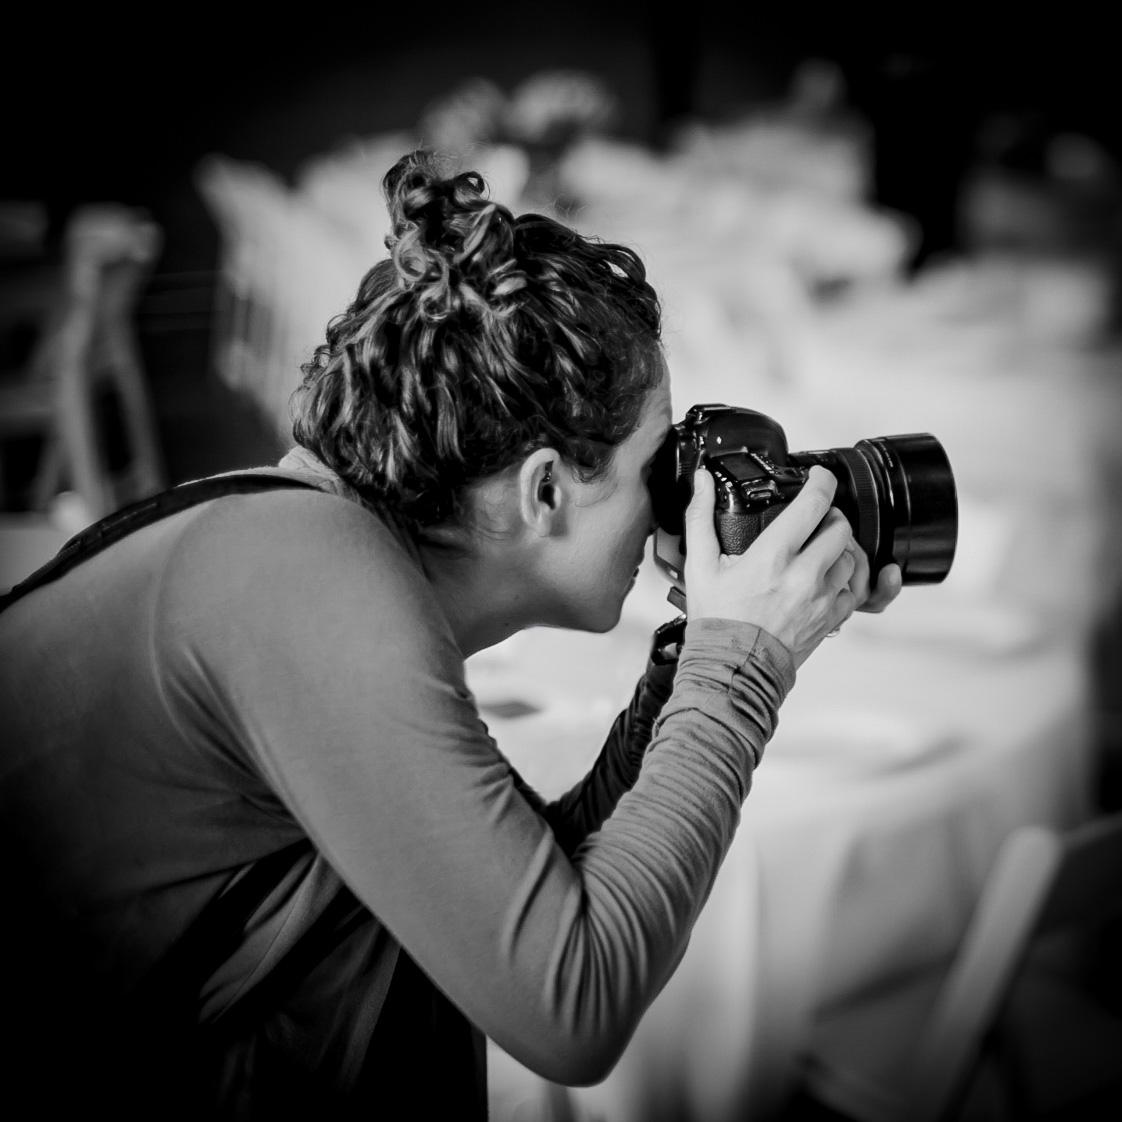 Julie shooting at a wedding.